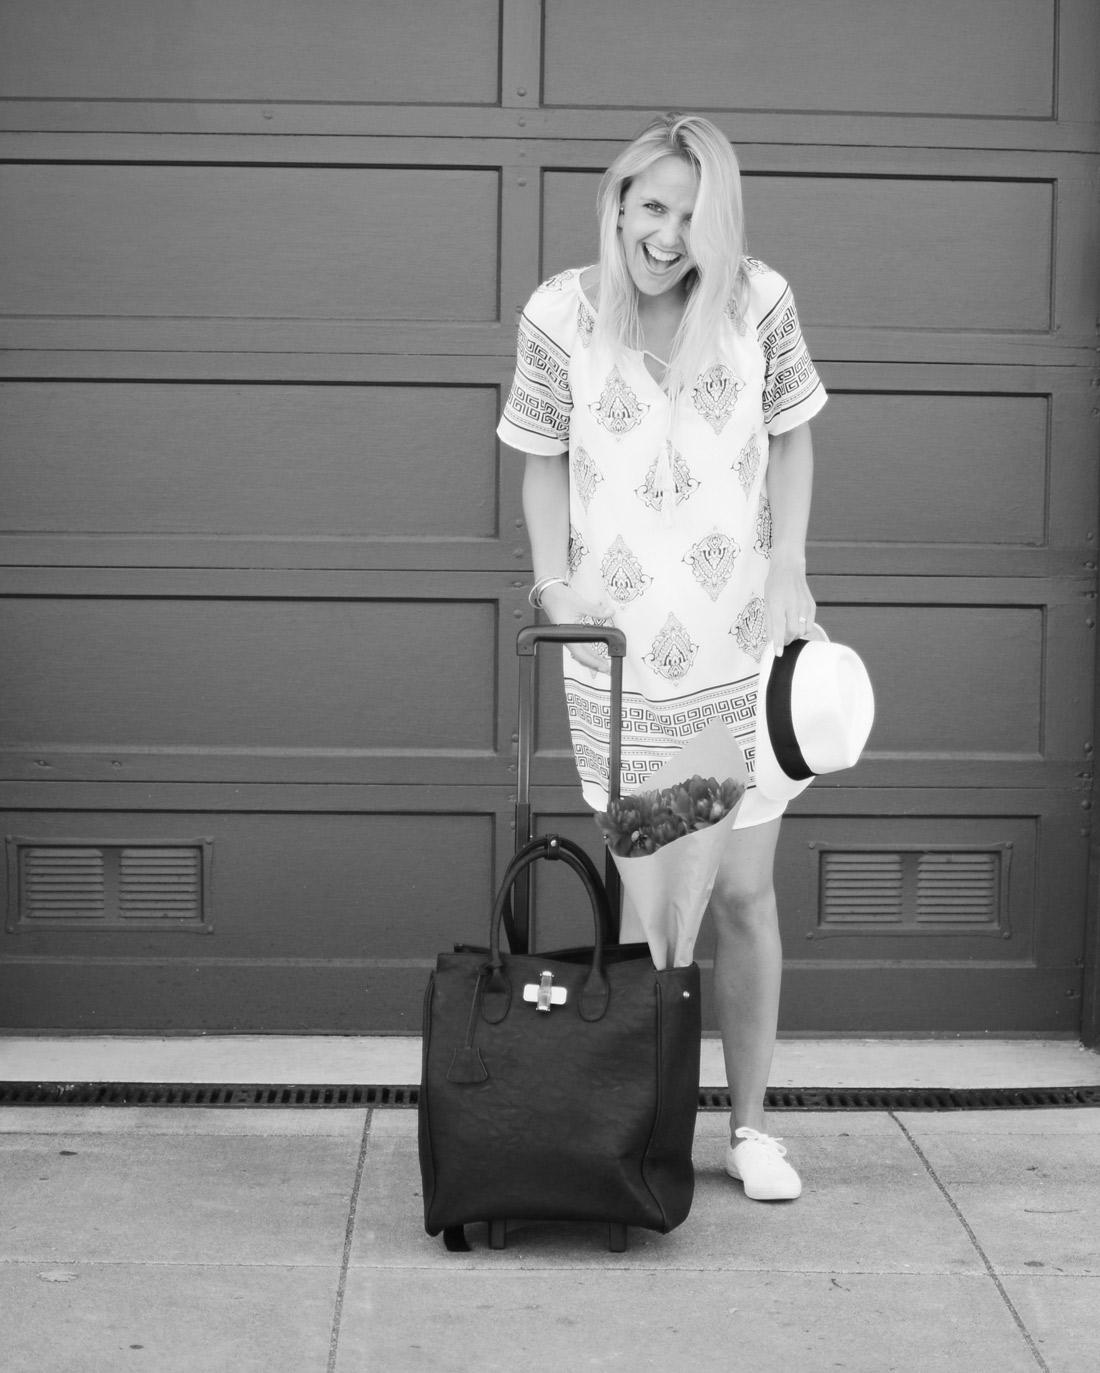 bag-at-you-travel-blog-trolley